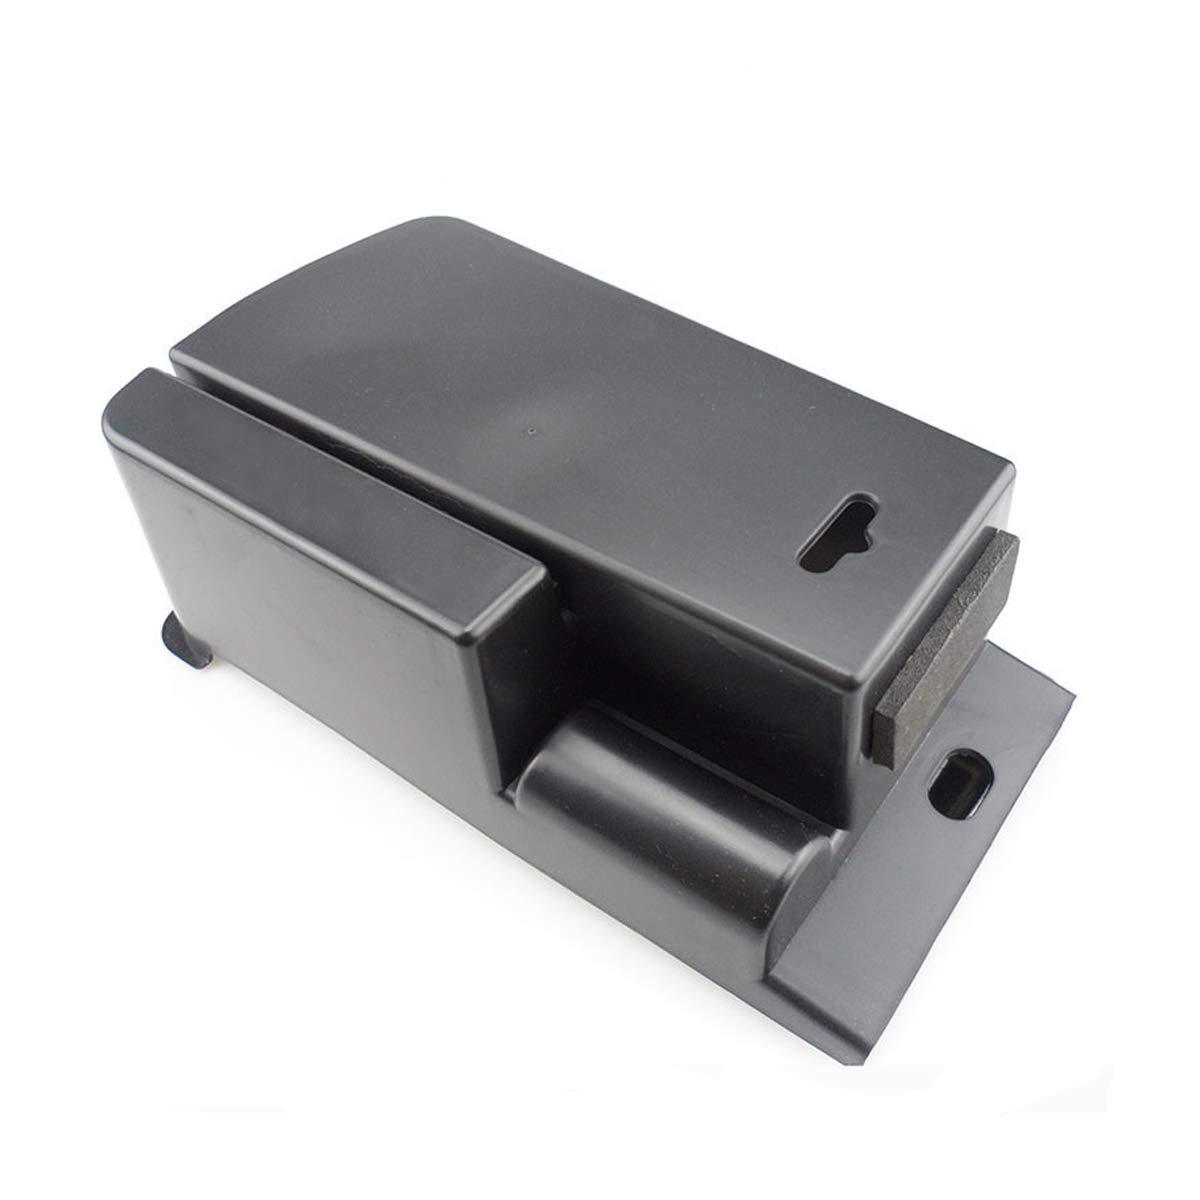 GOFORJUMP Caja de Almacenamiento de Paleta de Caja de Almacenamiento de Guantes de reposabrazos Central Negro ABS para P//eugeot 3008 2011-2015 Accesorios para autom/óviles